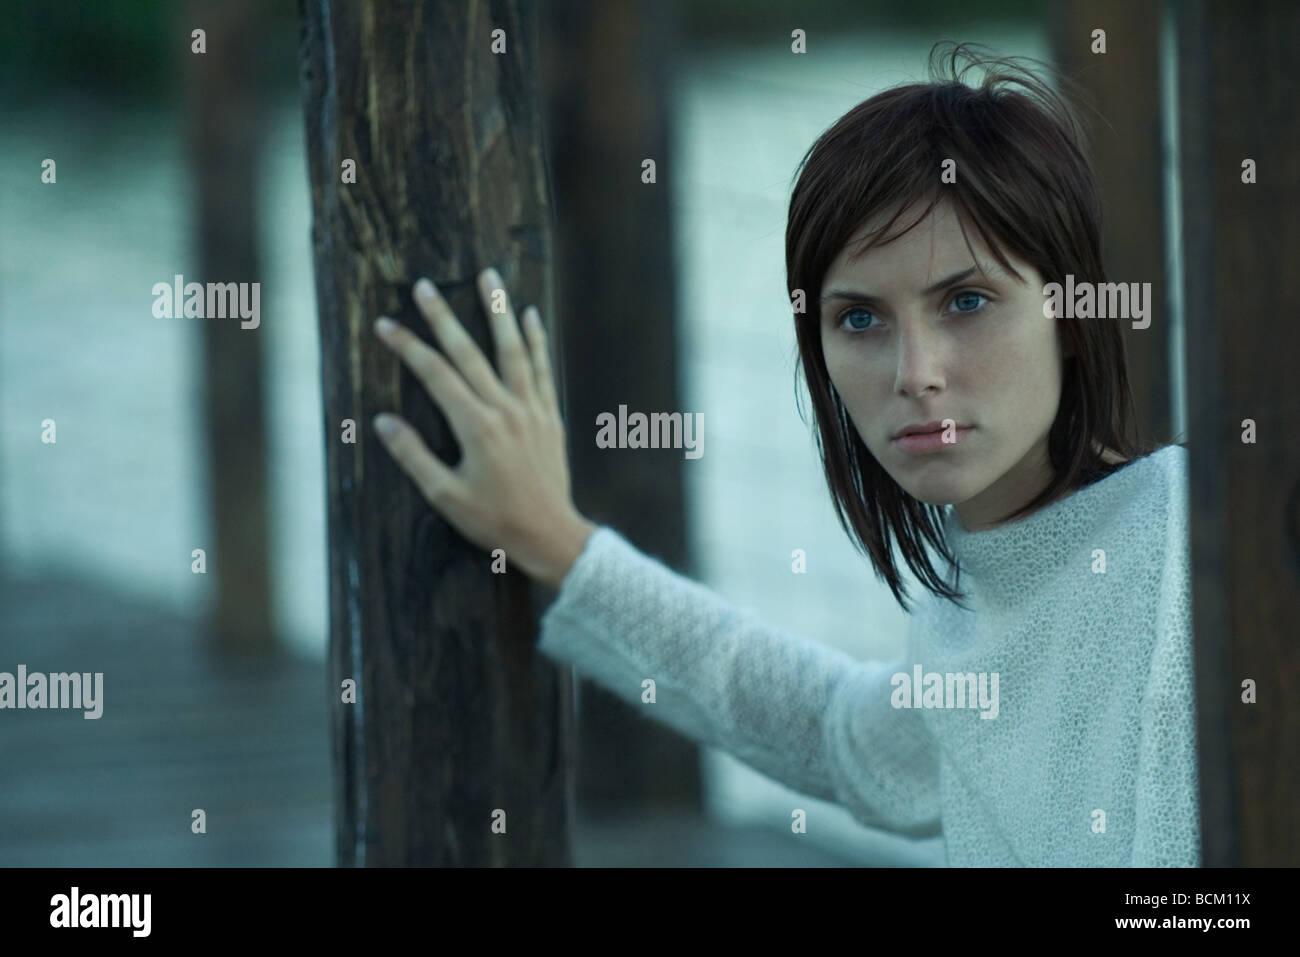 Frau am Pier, wegsehen, Kopf und Schultern an Holzpfosten gelehnt Stockbild